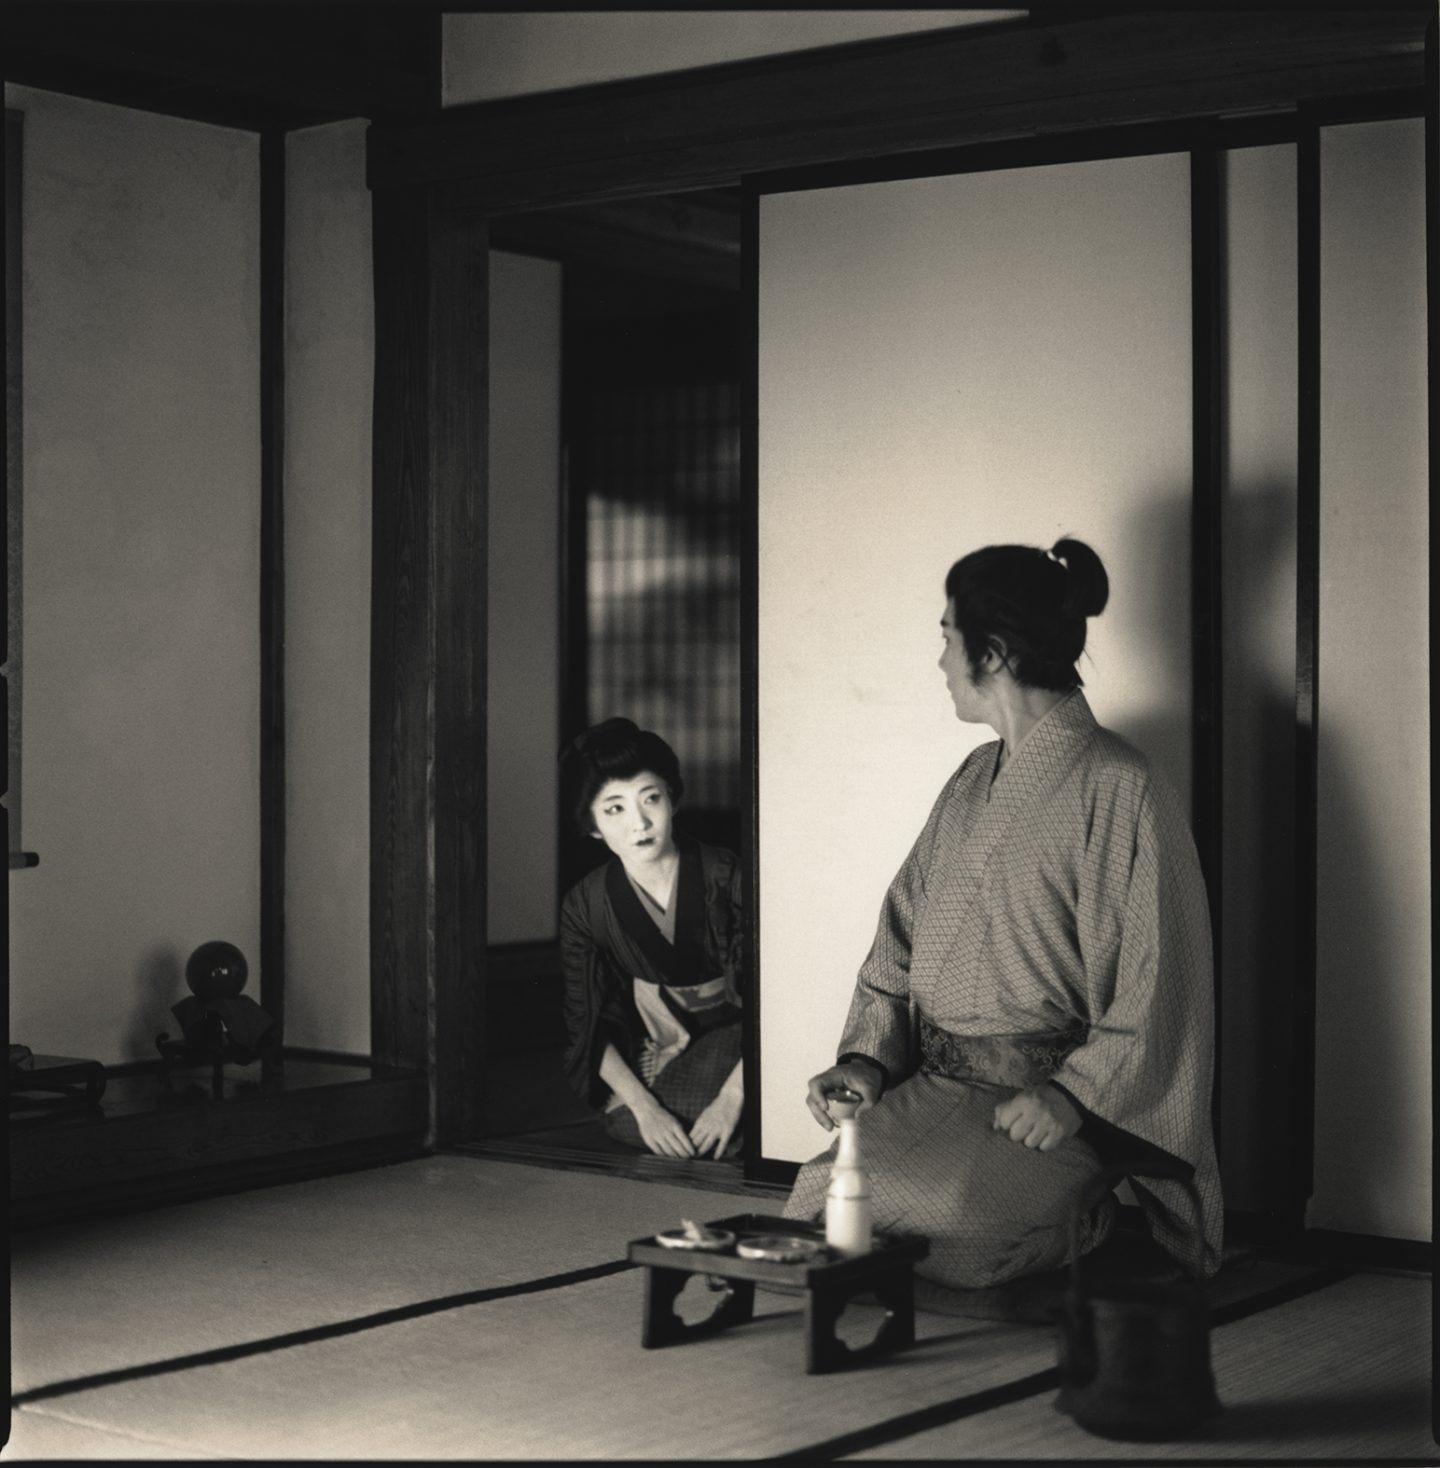 IGNANT-Photography-Hiroshi-Watanabe-Kwaidan-010